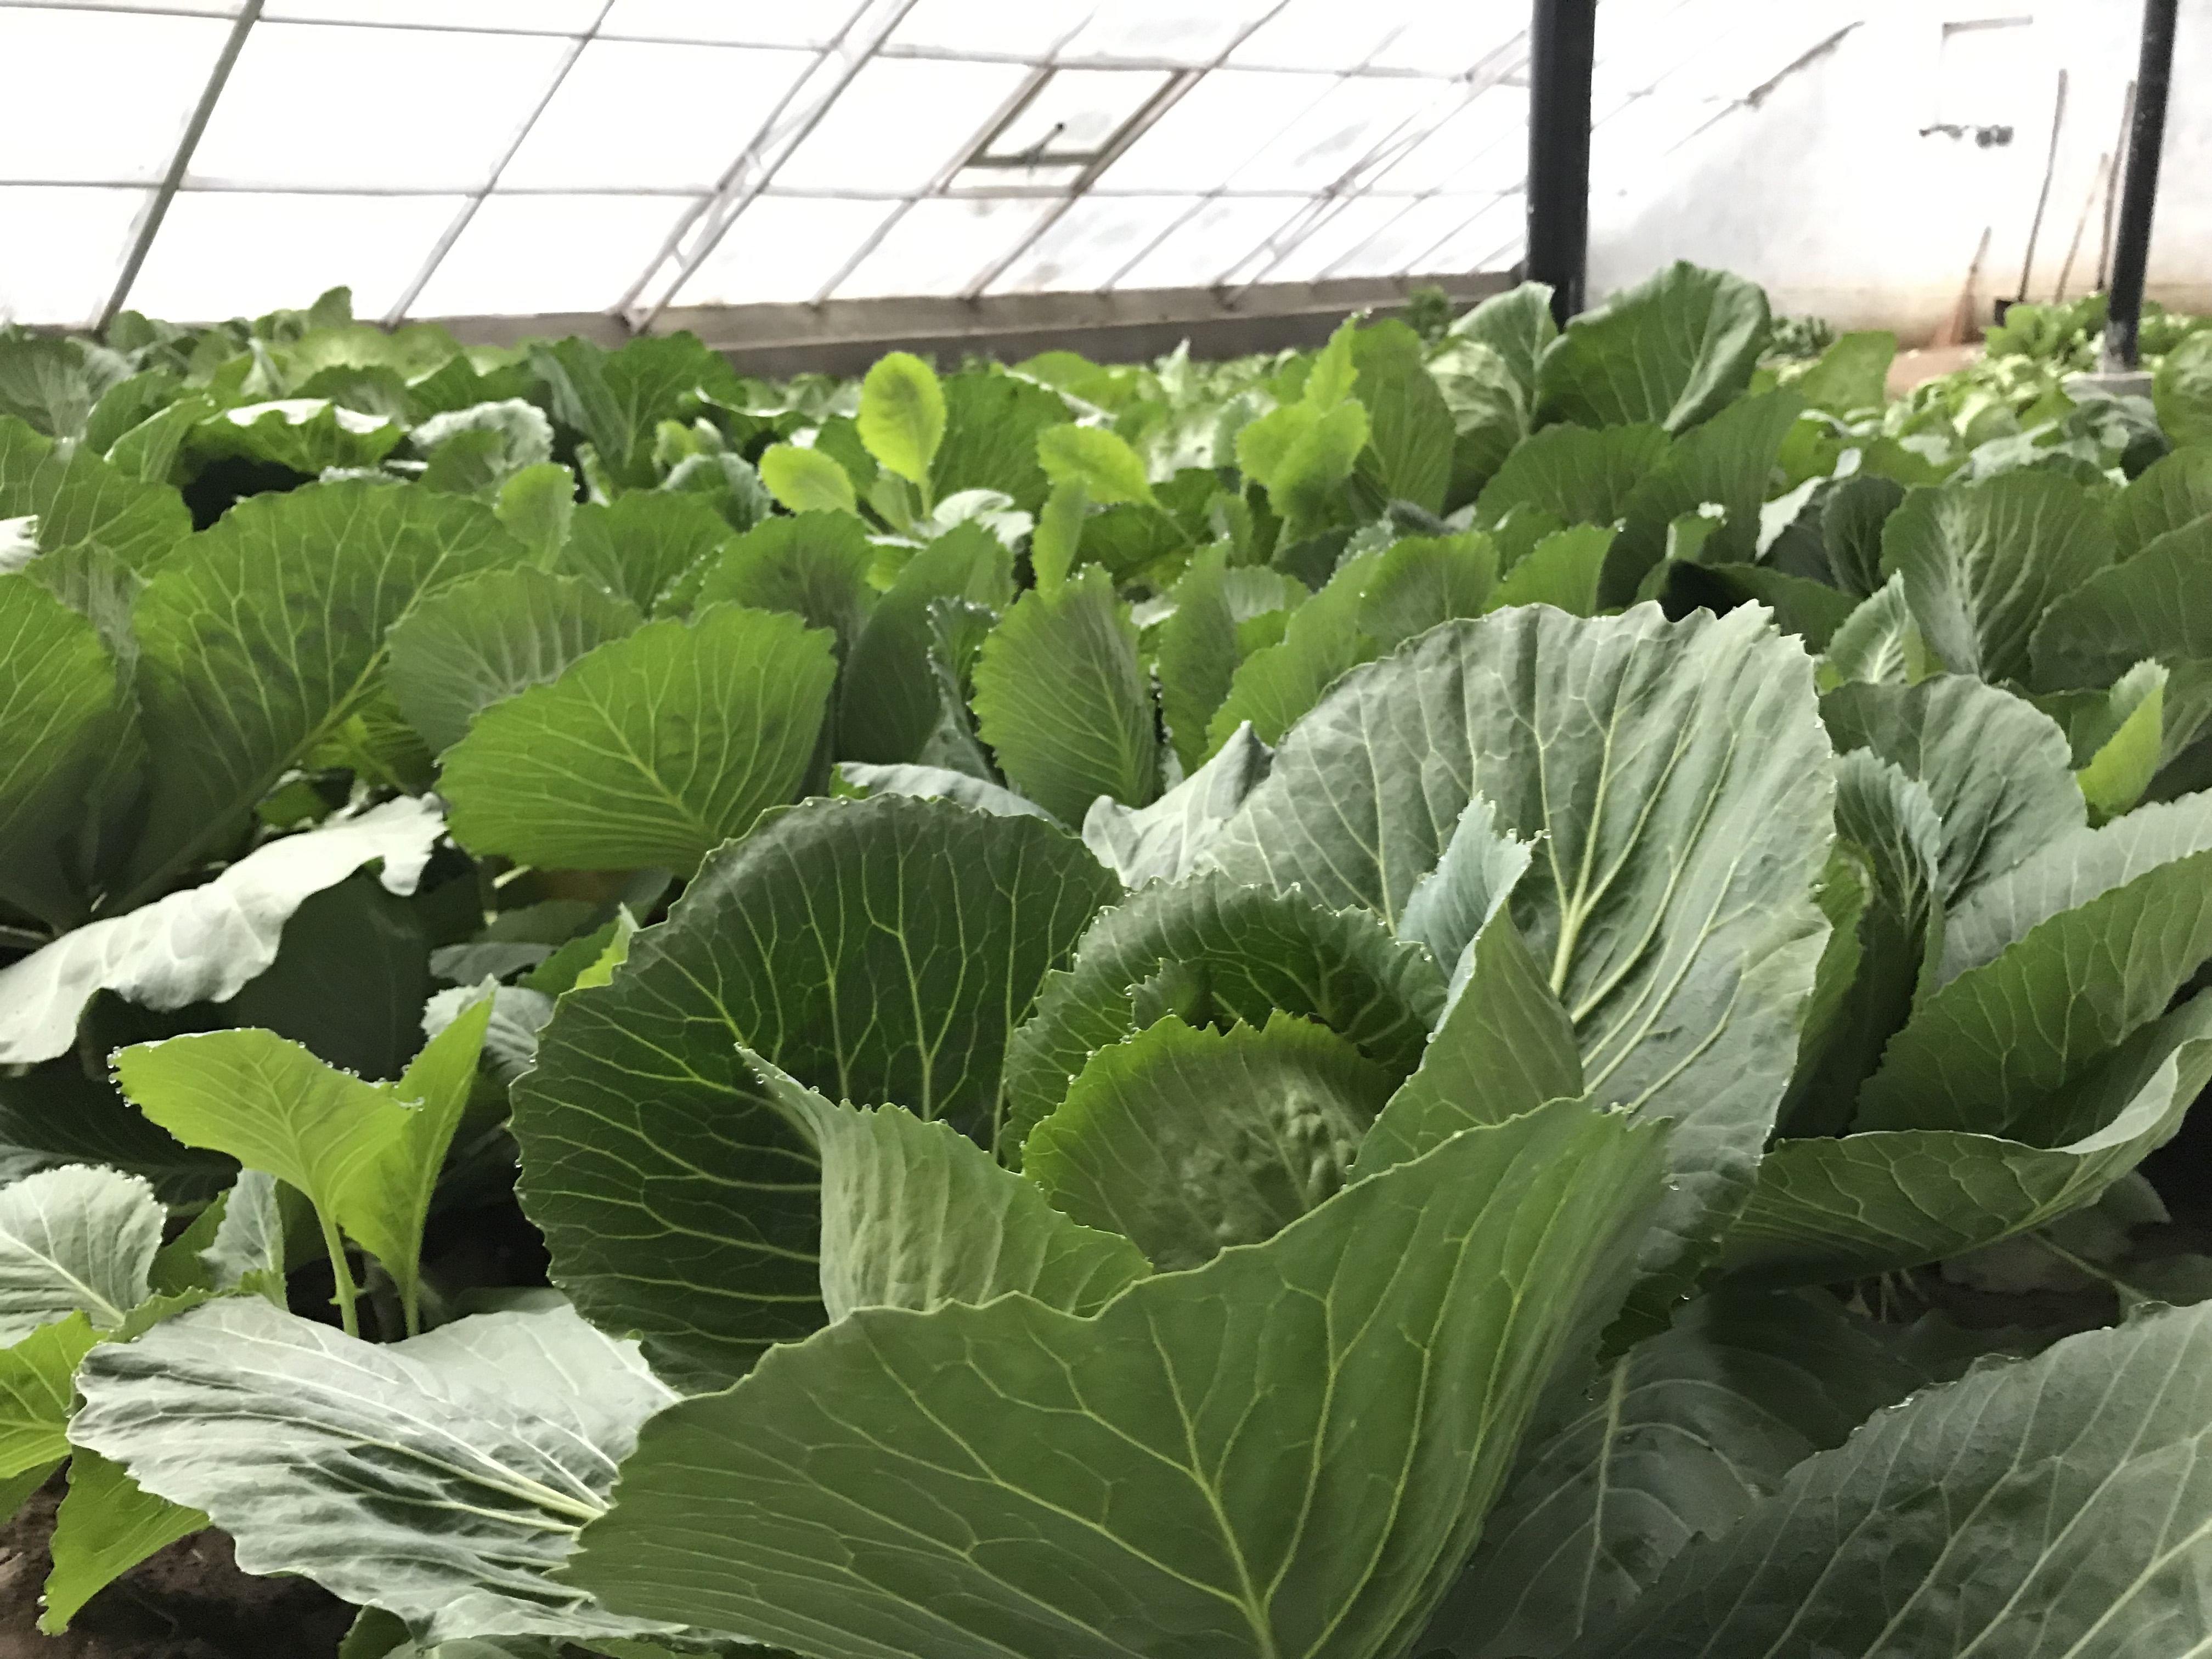 Inside the greenhouse. (Source: Dr Tsering Stobdan)